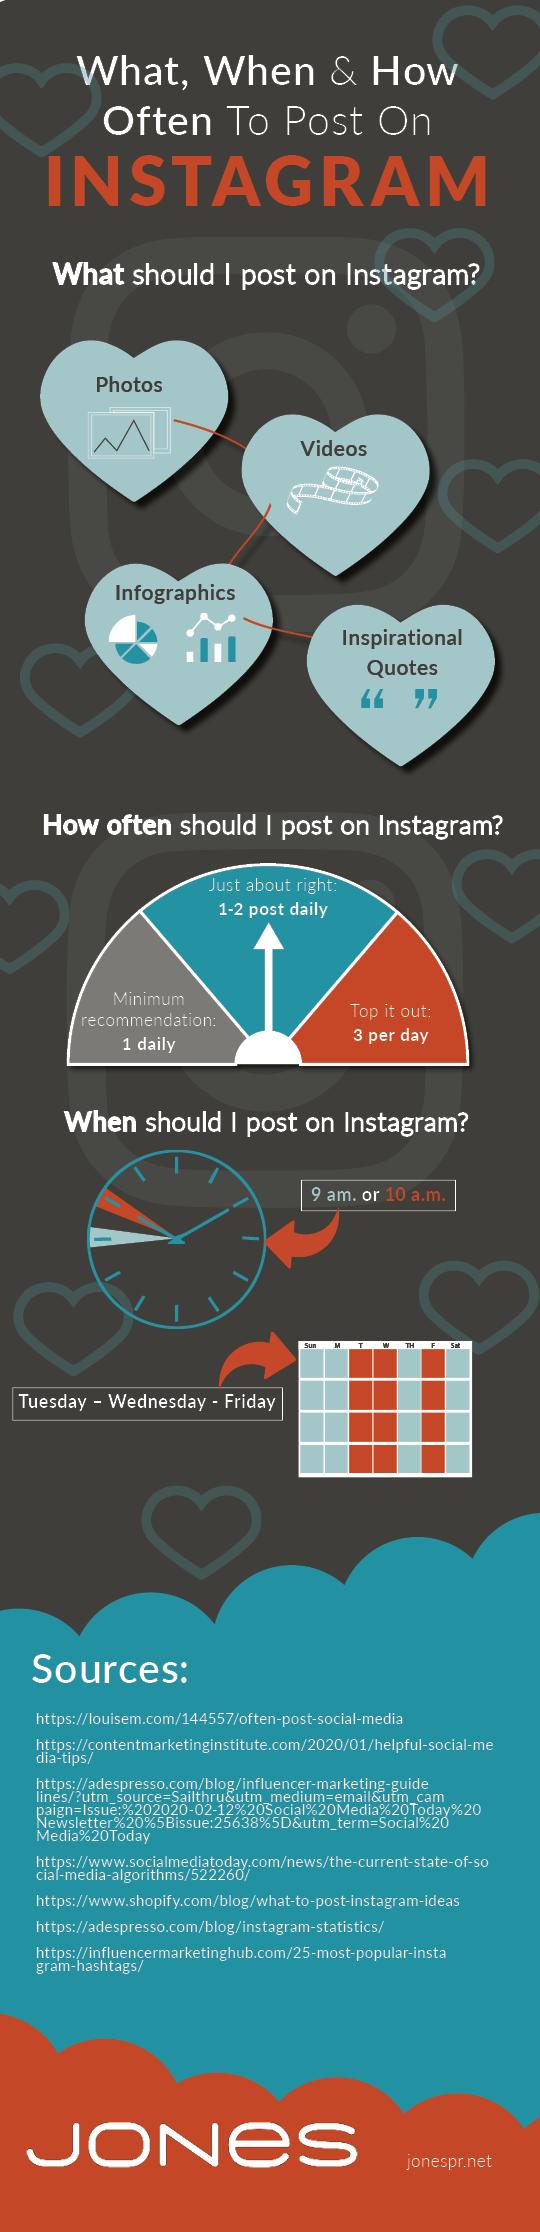 Jones complete social media guide infographic instagram